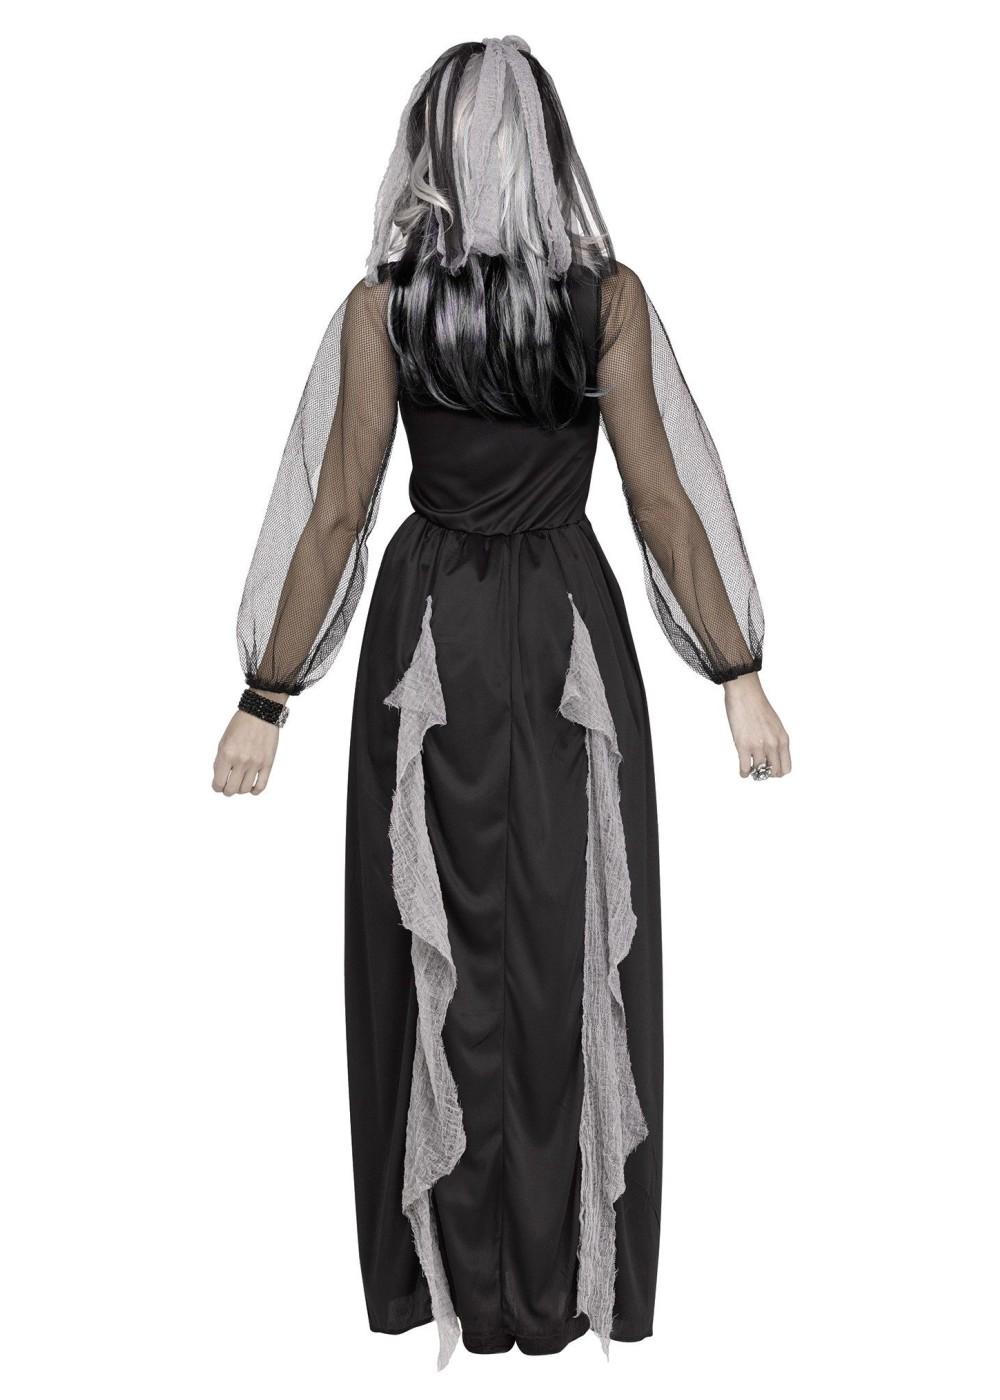 Skeleton Bride of the Night Women Costume